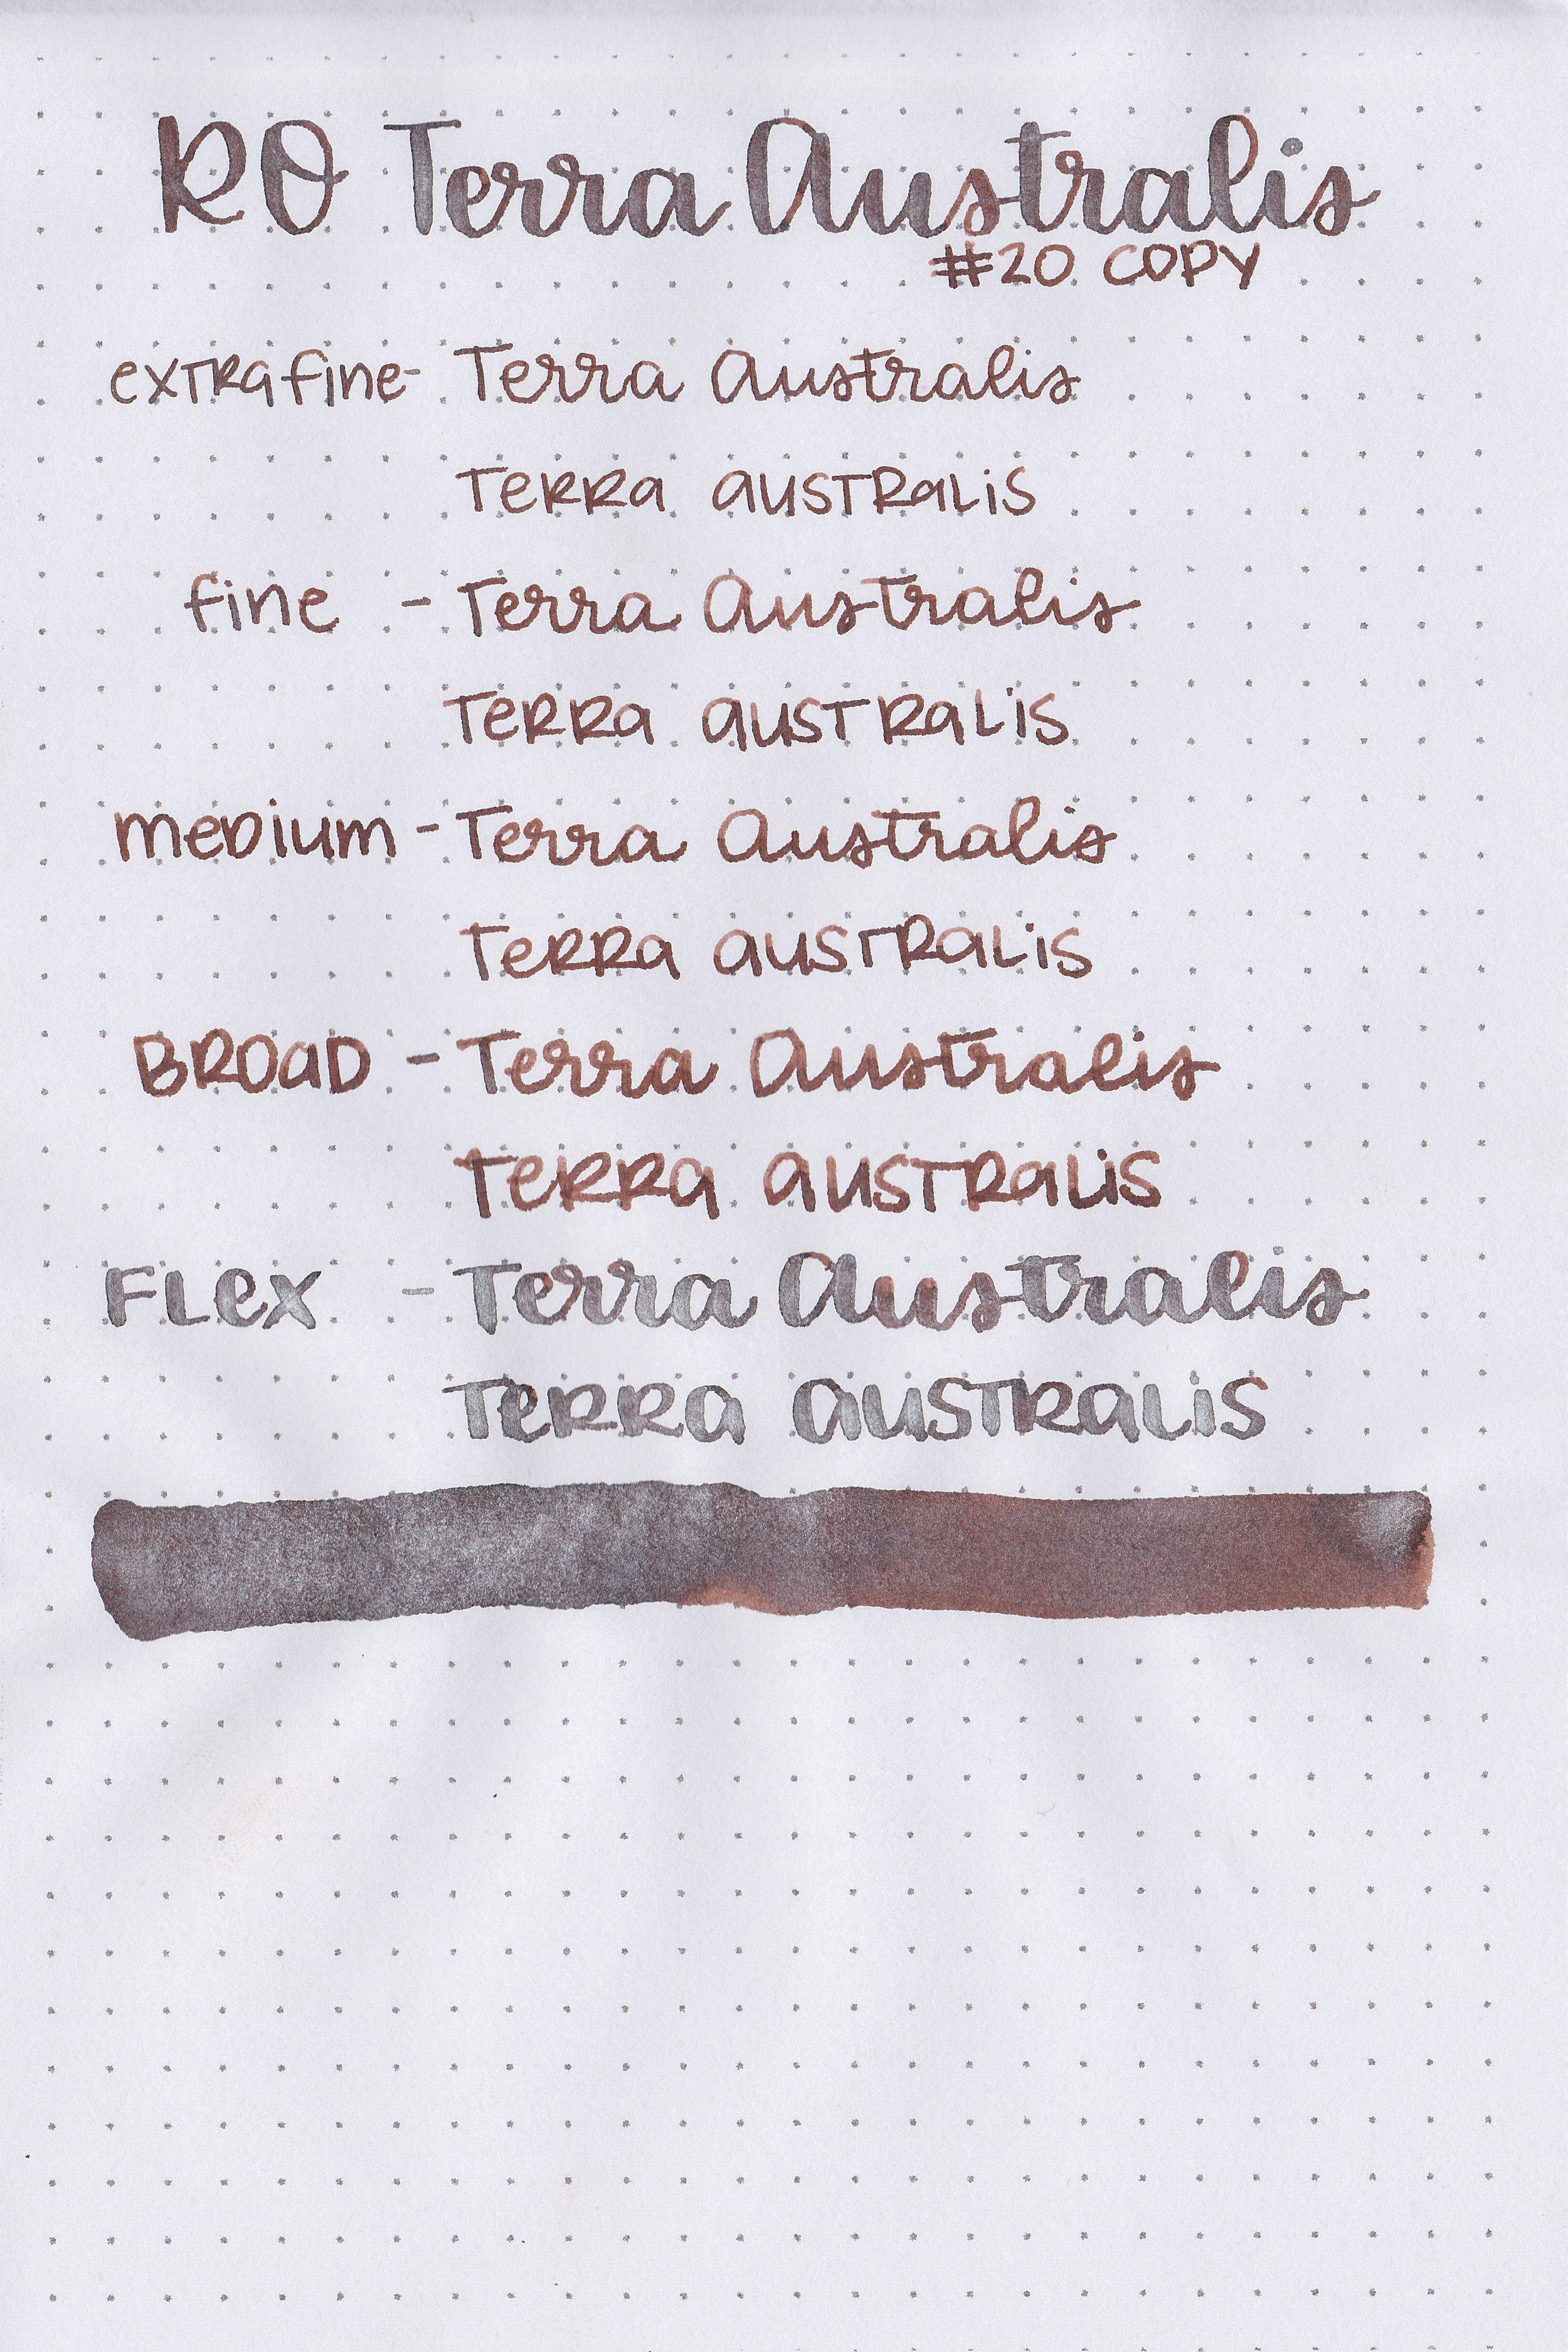 ro-terra-australis-21.jpg